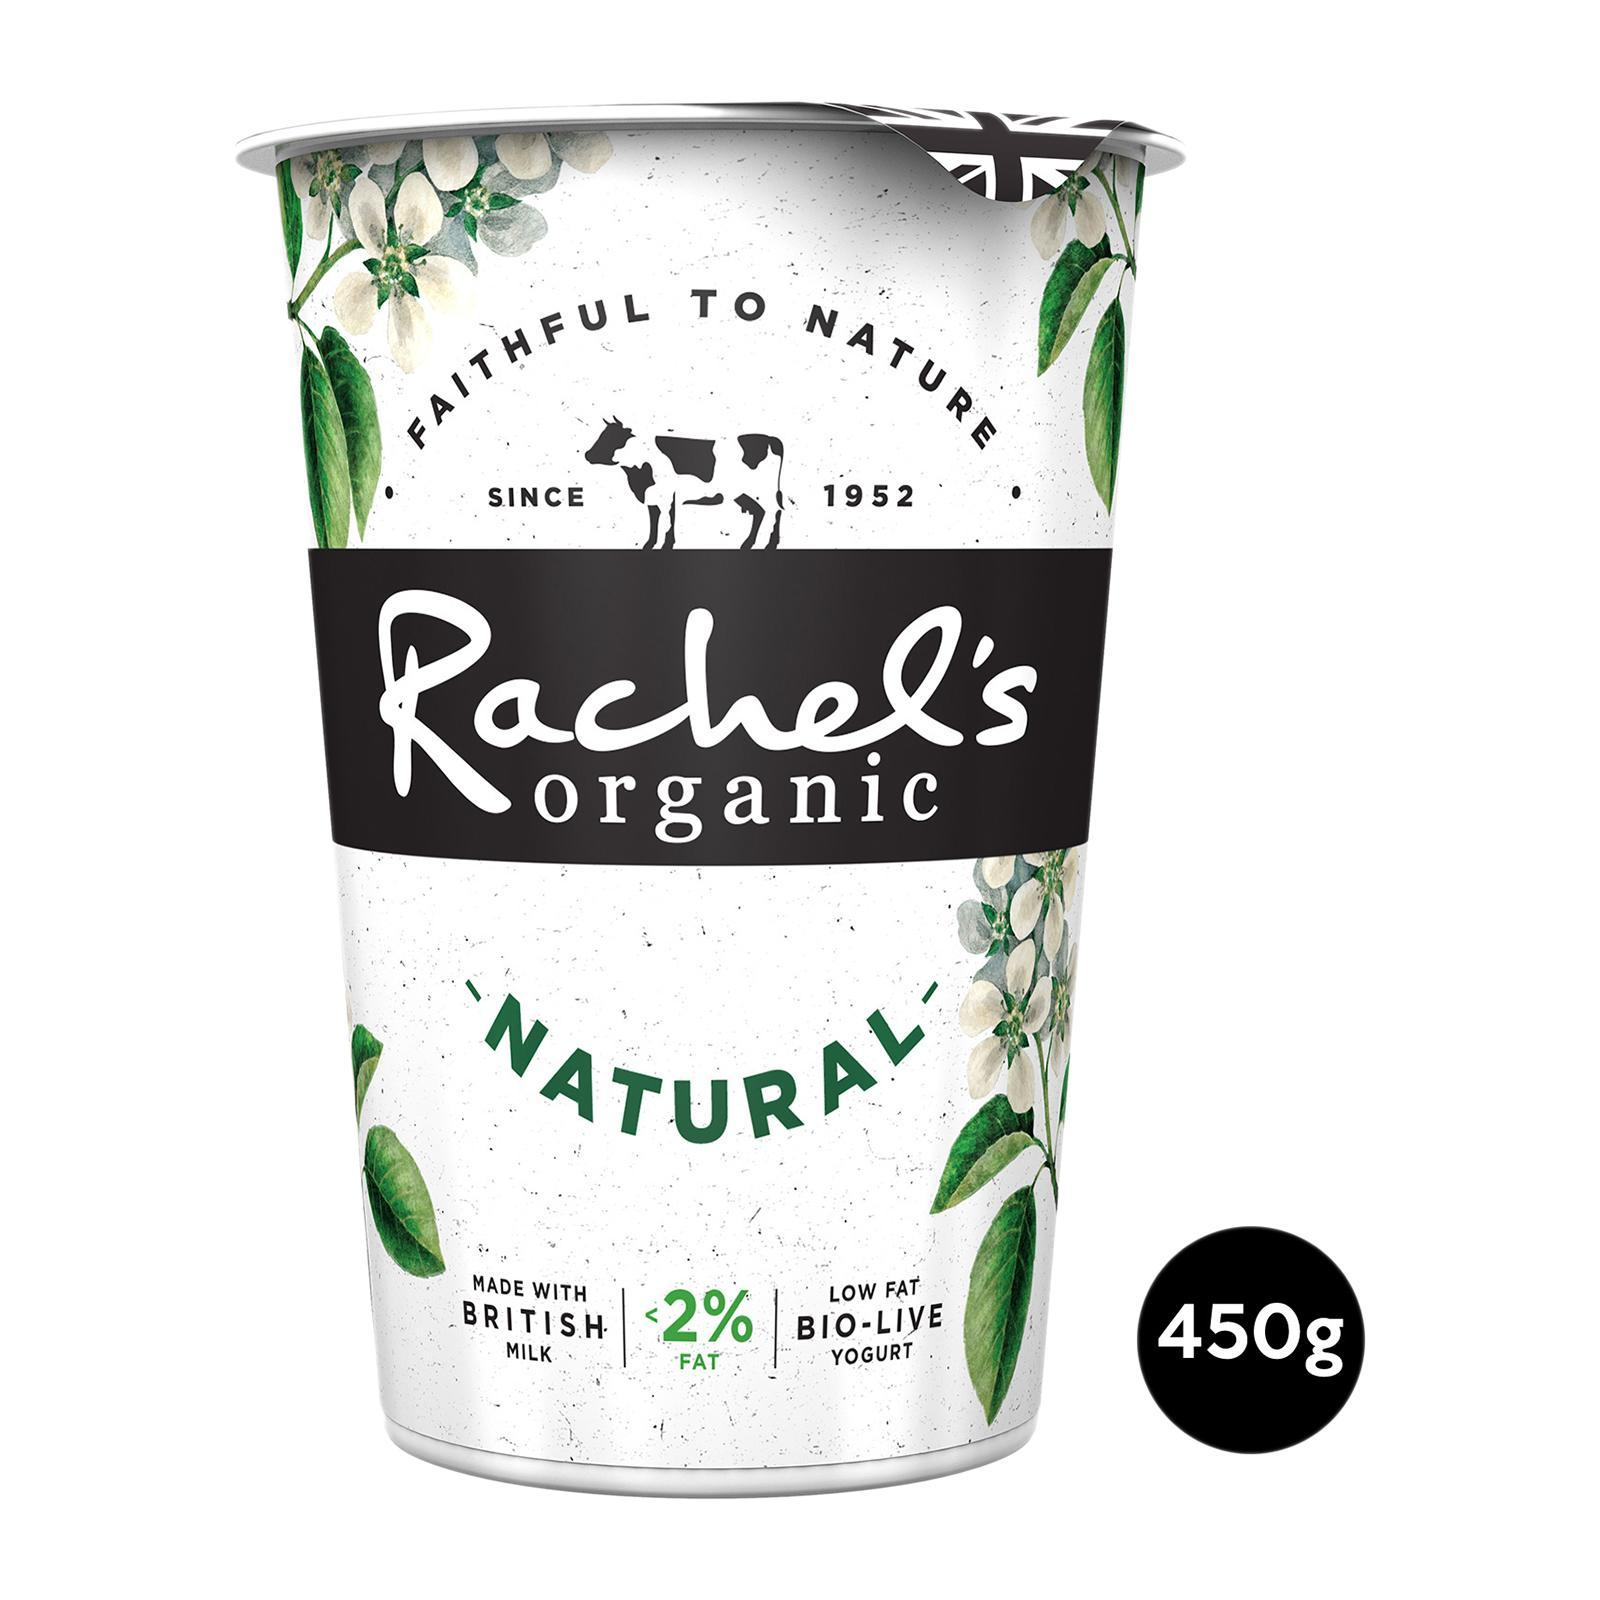 Rachel's Organic Low Fat Natural Bio-Live Yoghurt